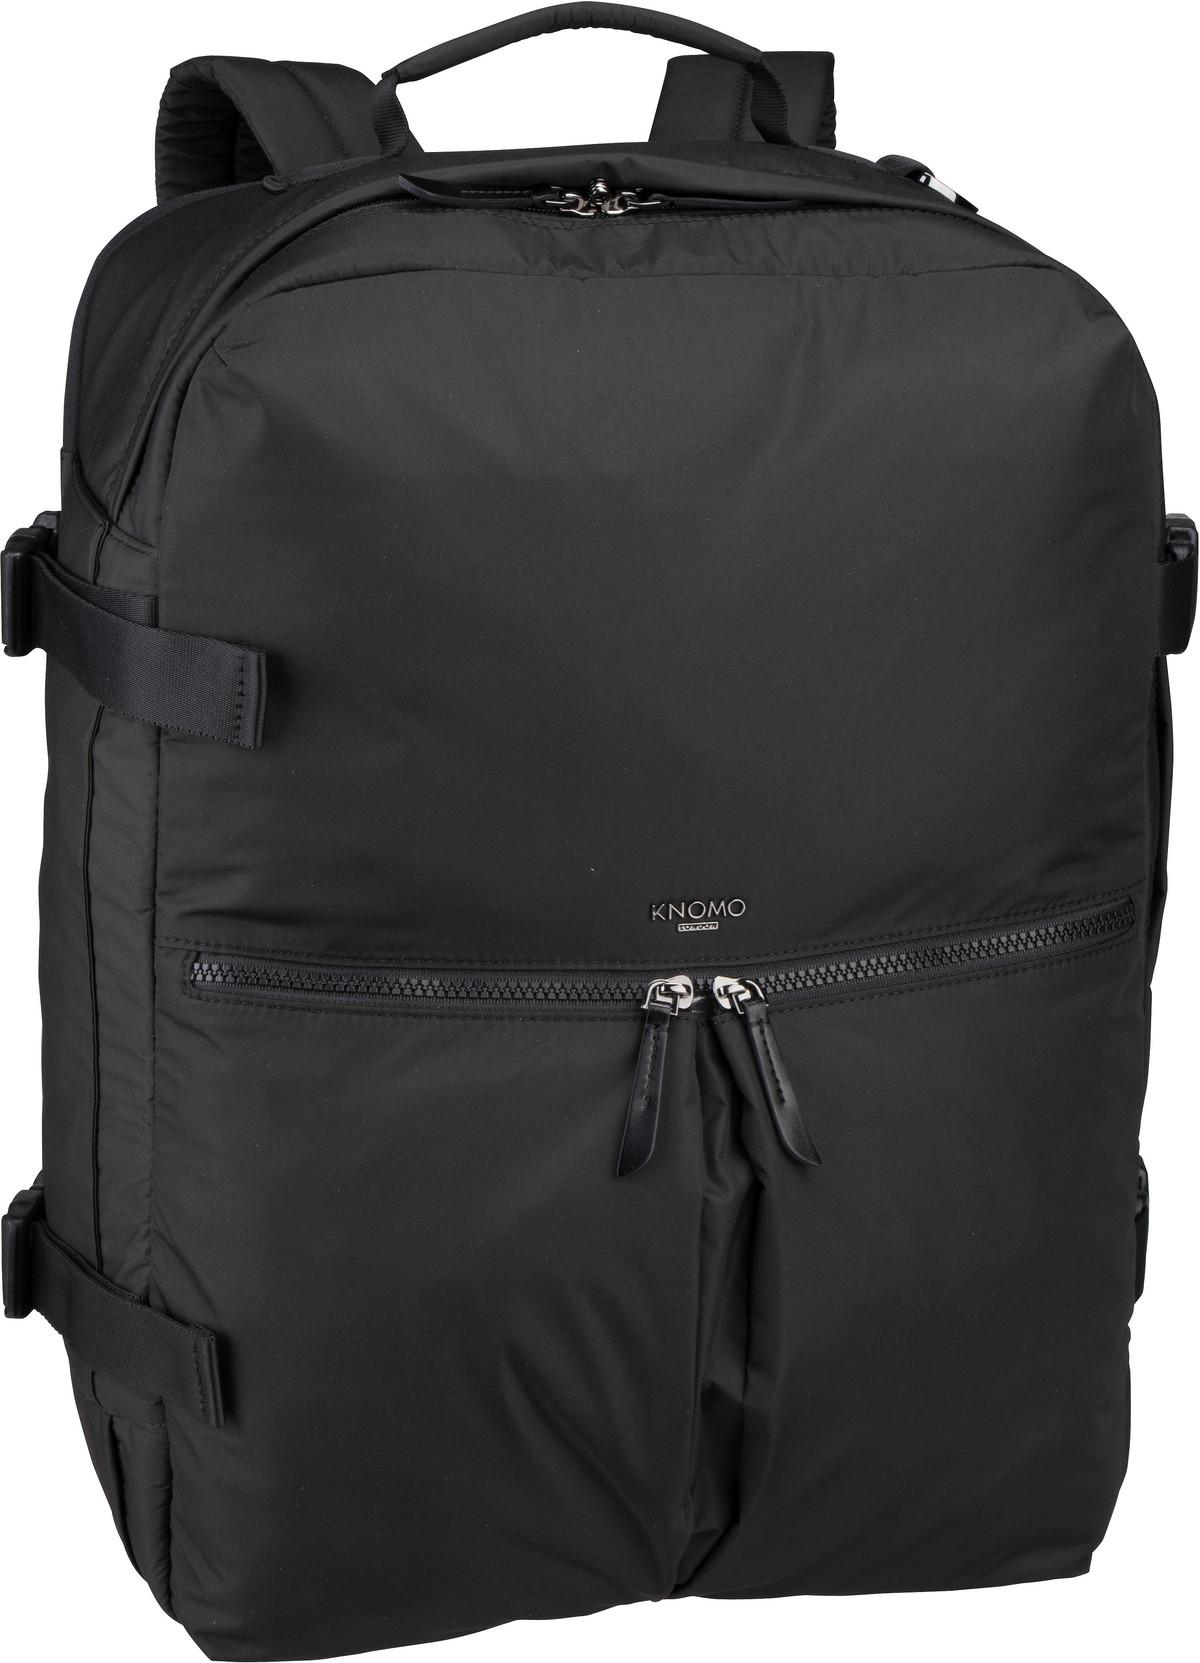 Rucksack / Daypack Dalston Budapest 15.6'' Black (24.2 Liter)